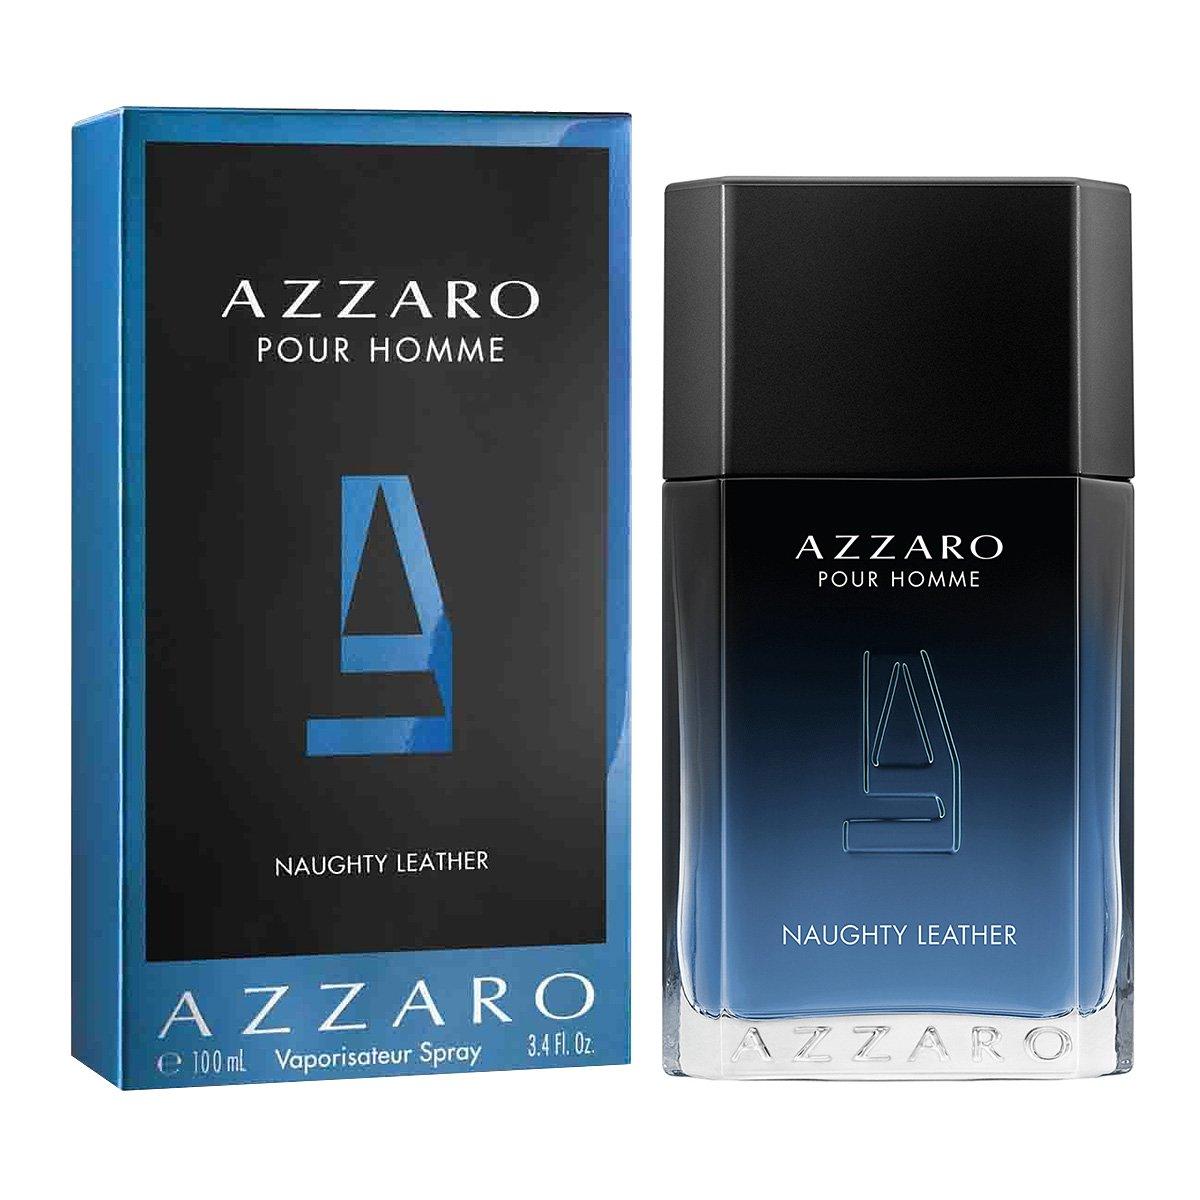 Azzaro Naughty Leather